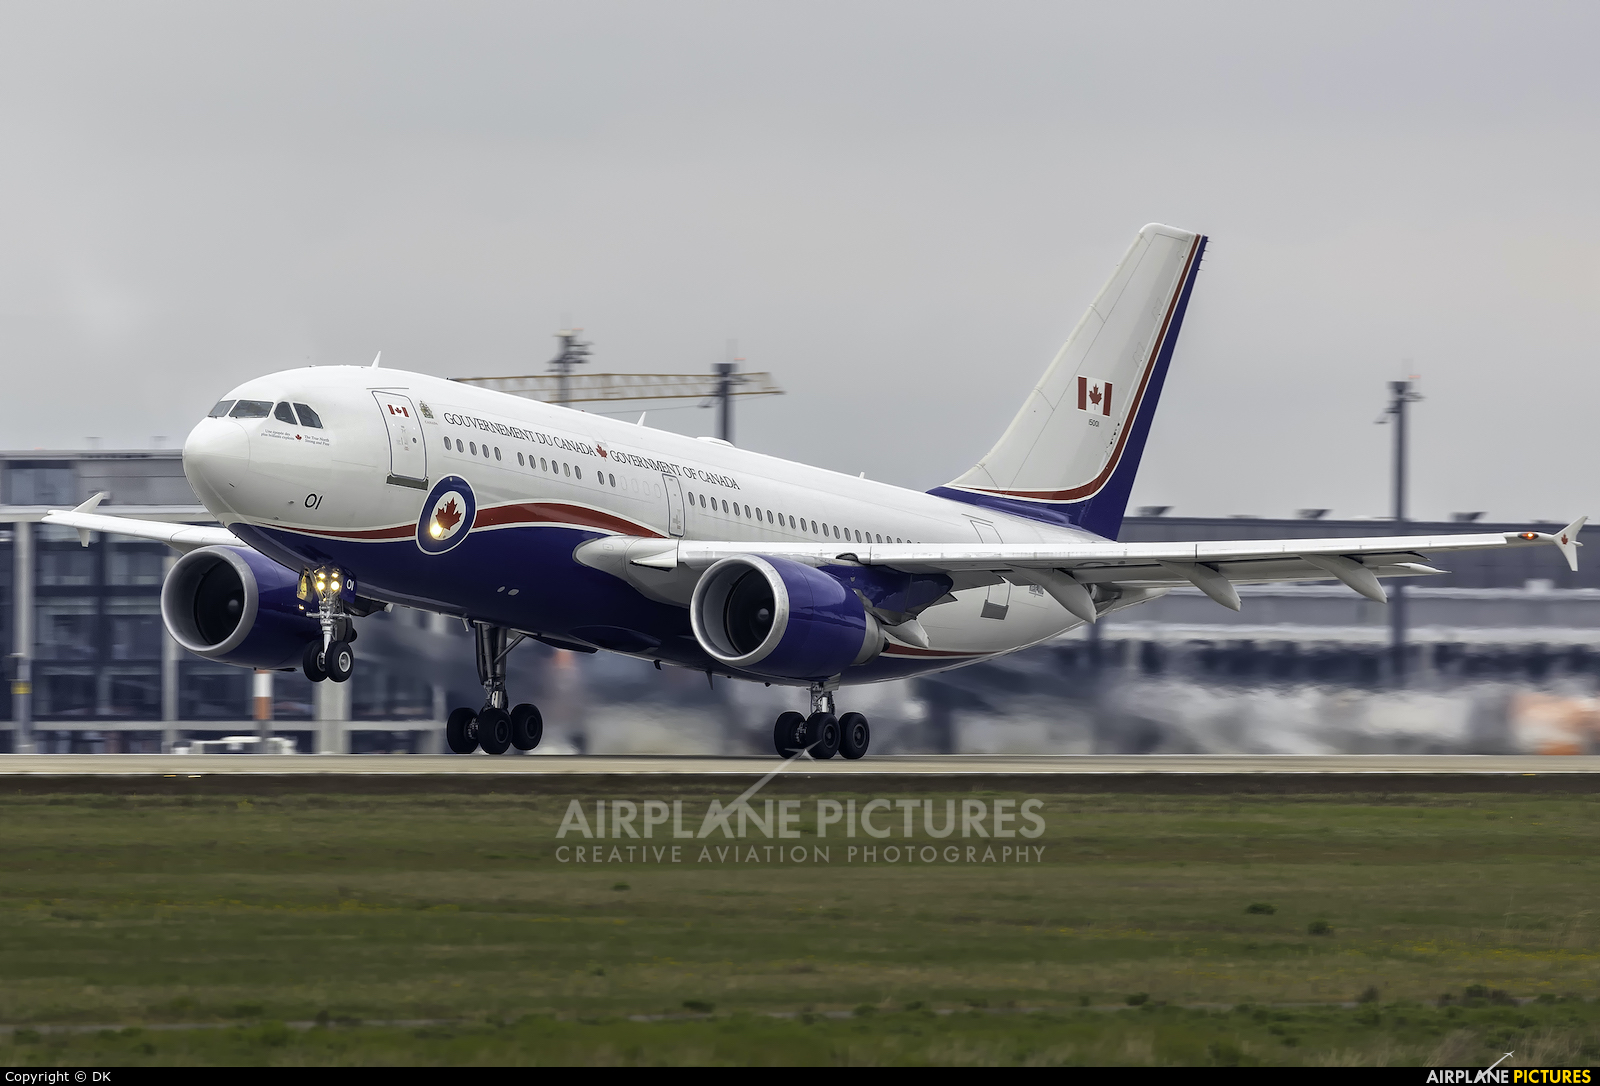 Canada - Air Force 15001 aircraft at Berlin - Brandenburg